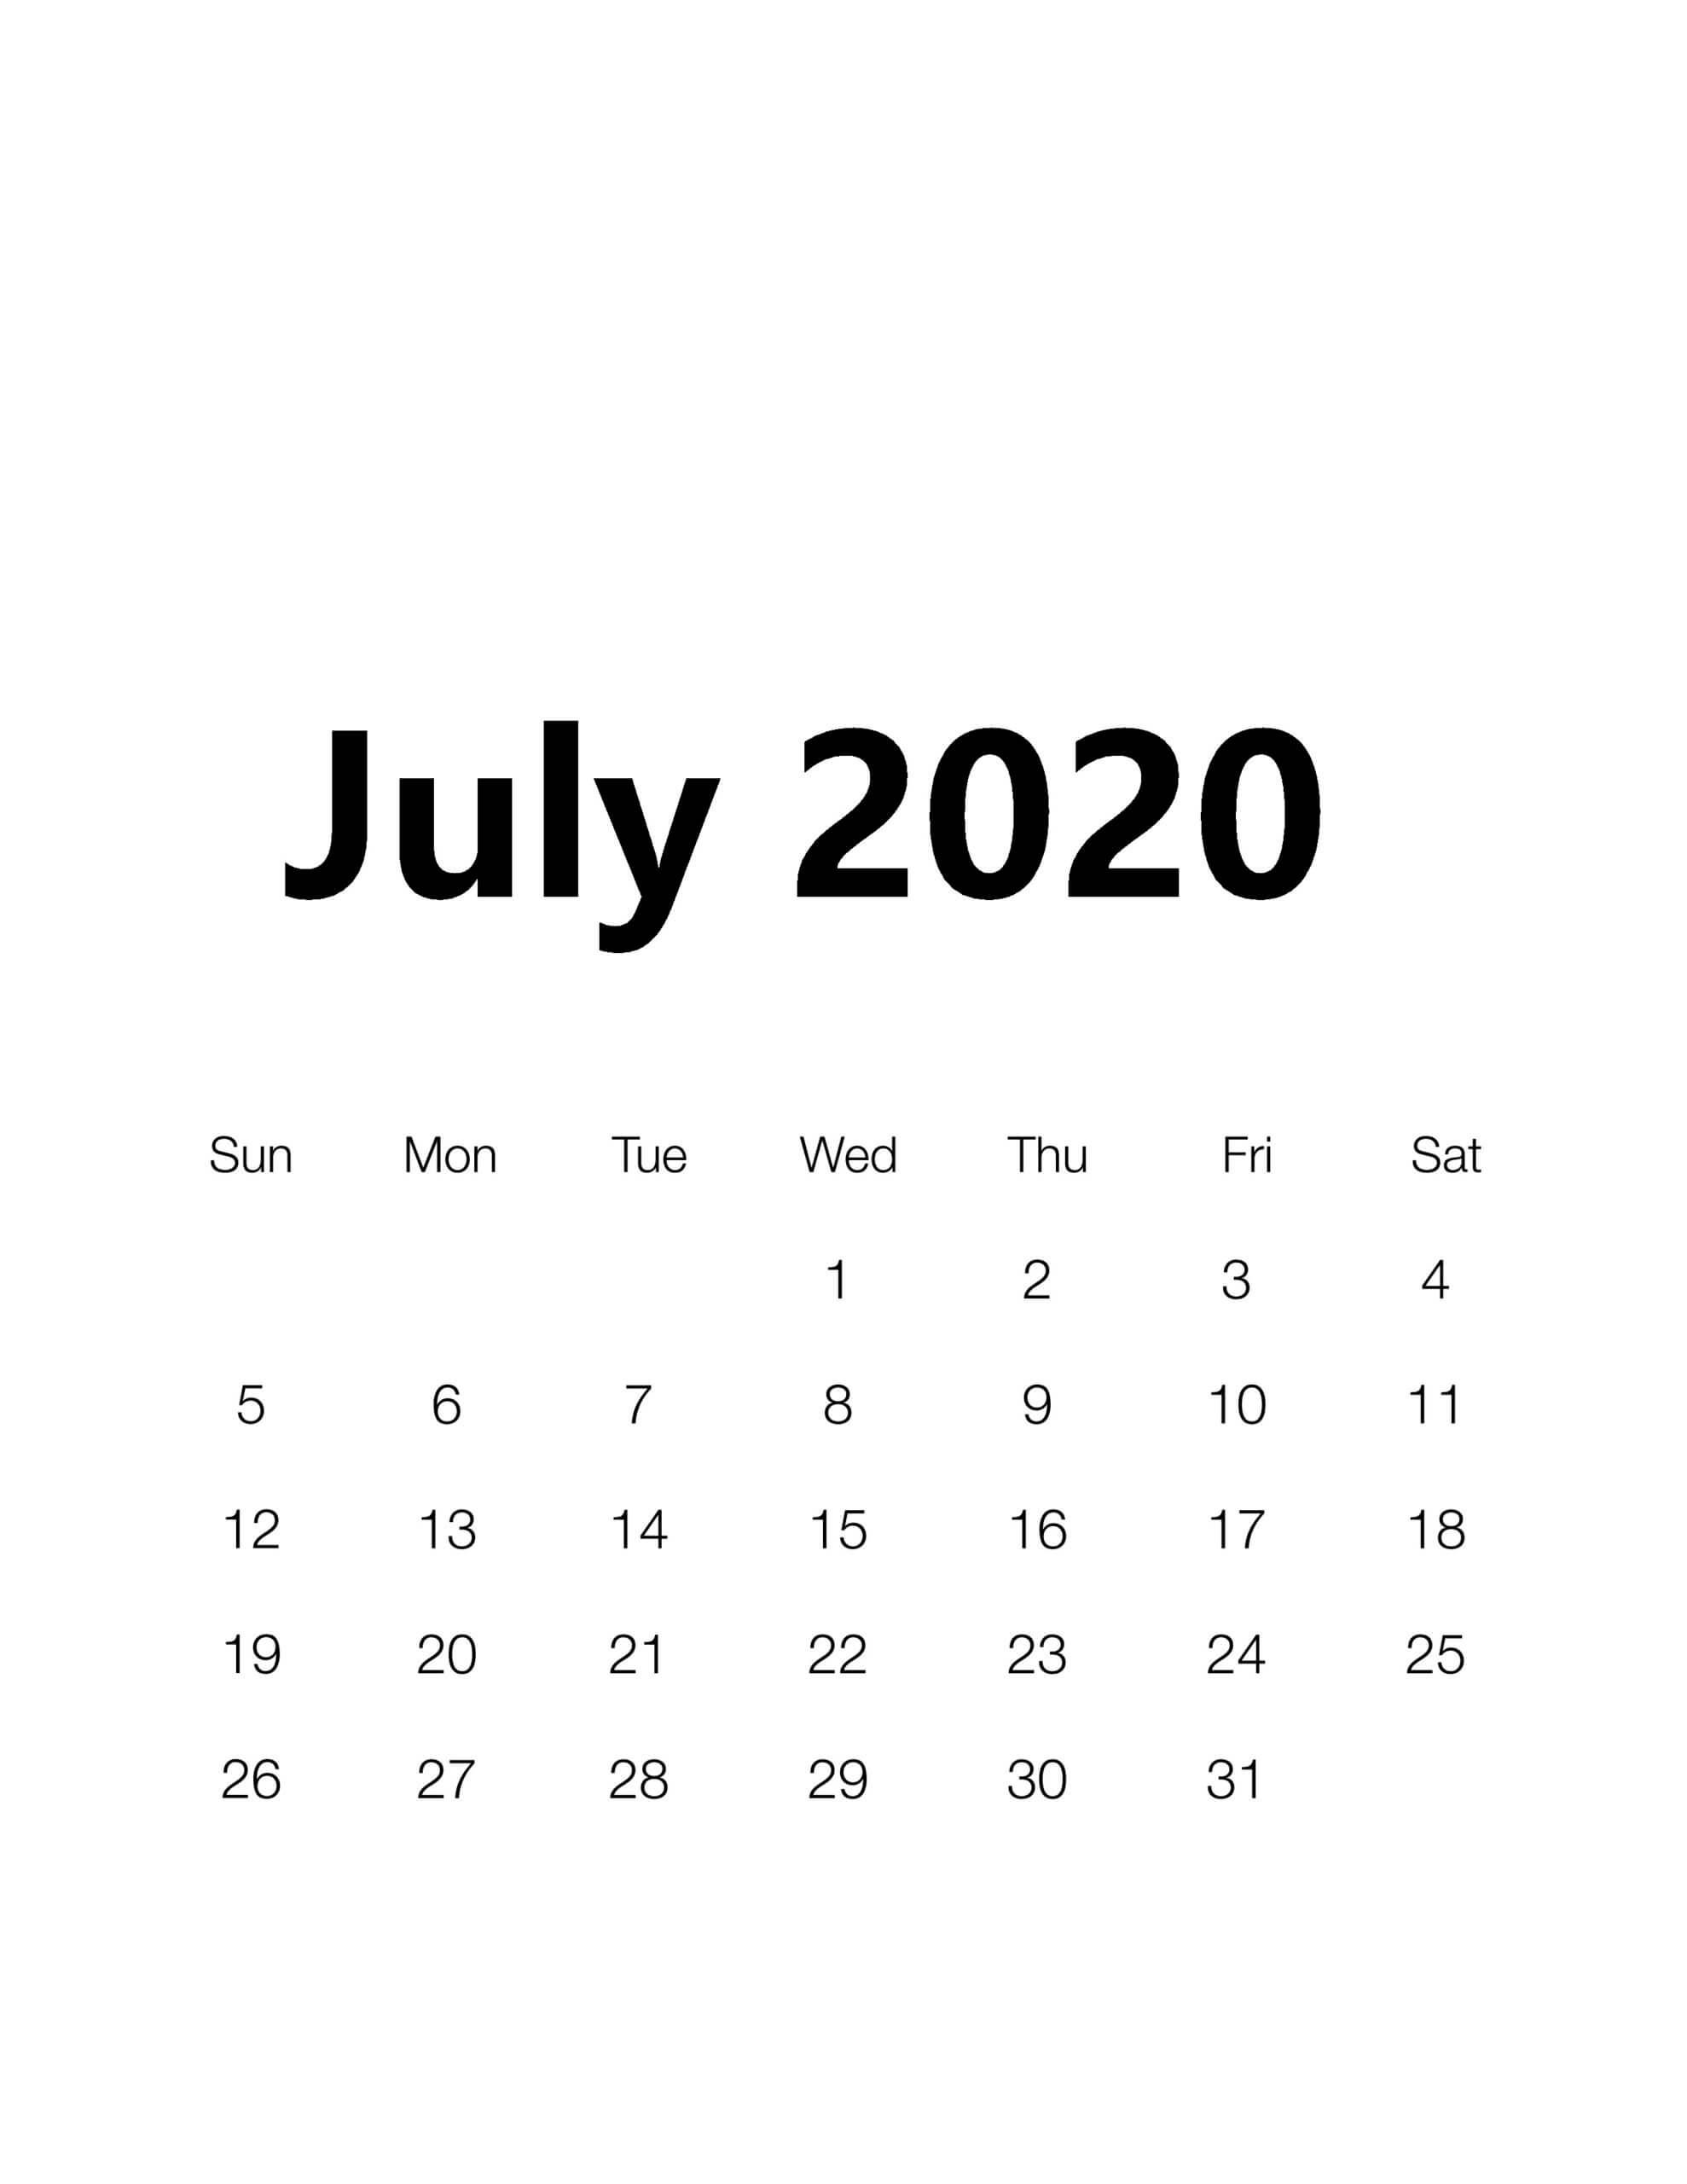 PDF July 2020 Calendar Template